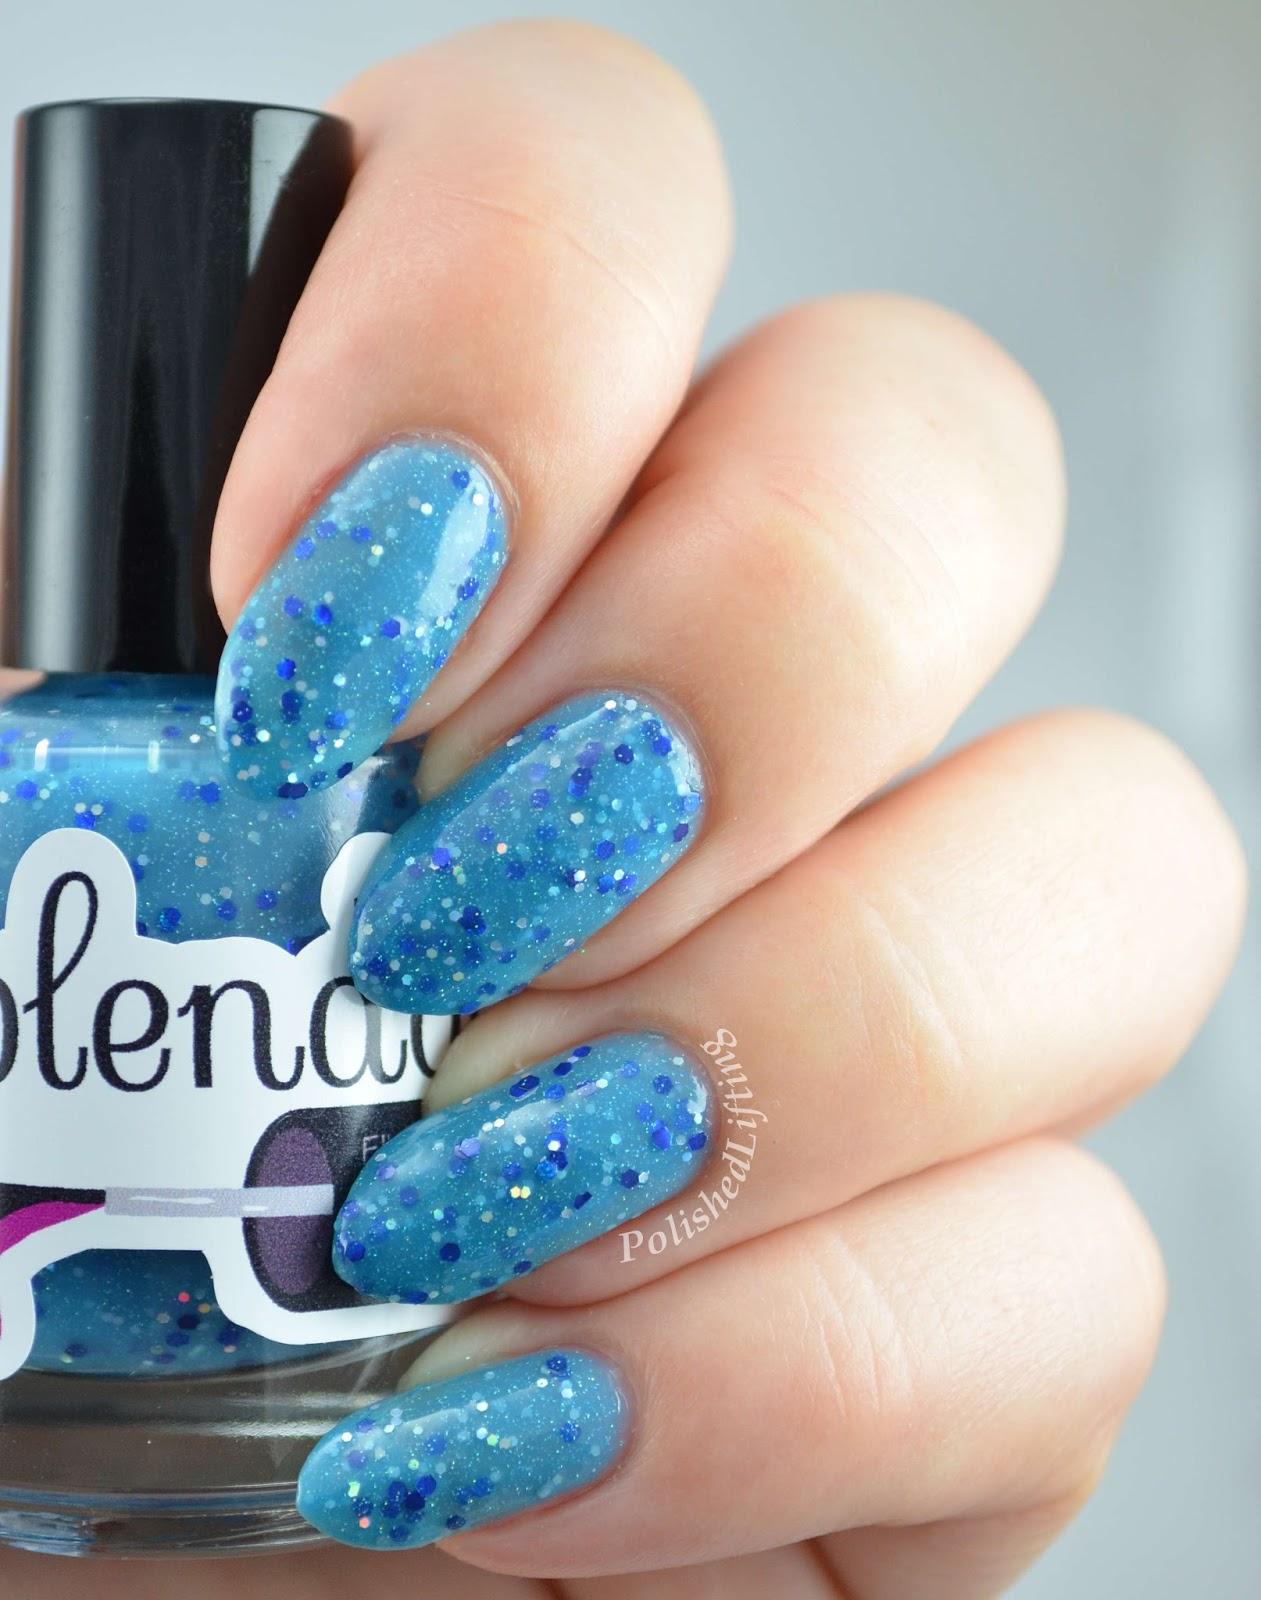 Splendor Nail Lacquer Neptune